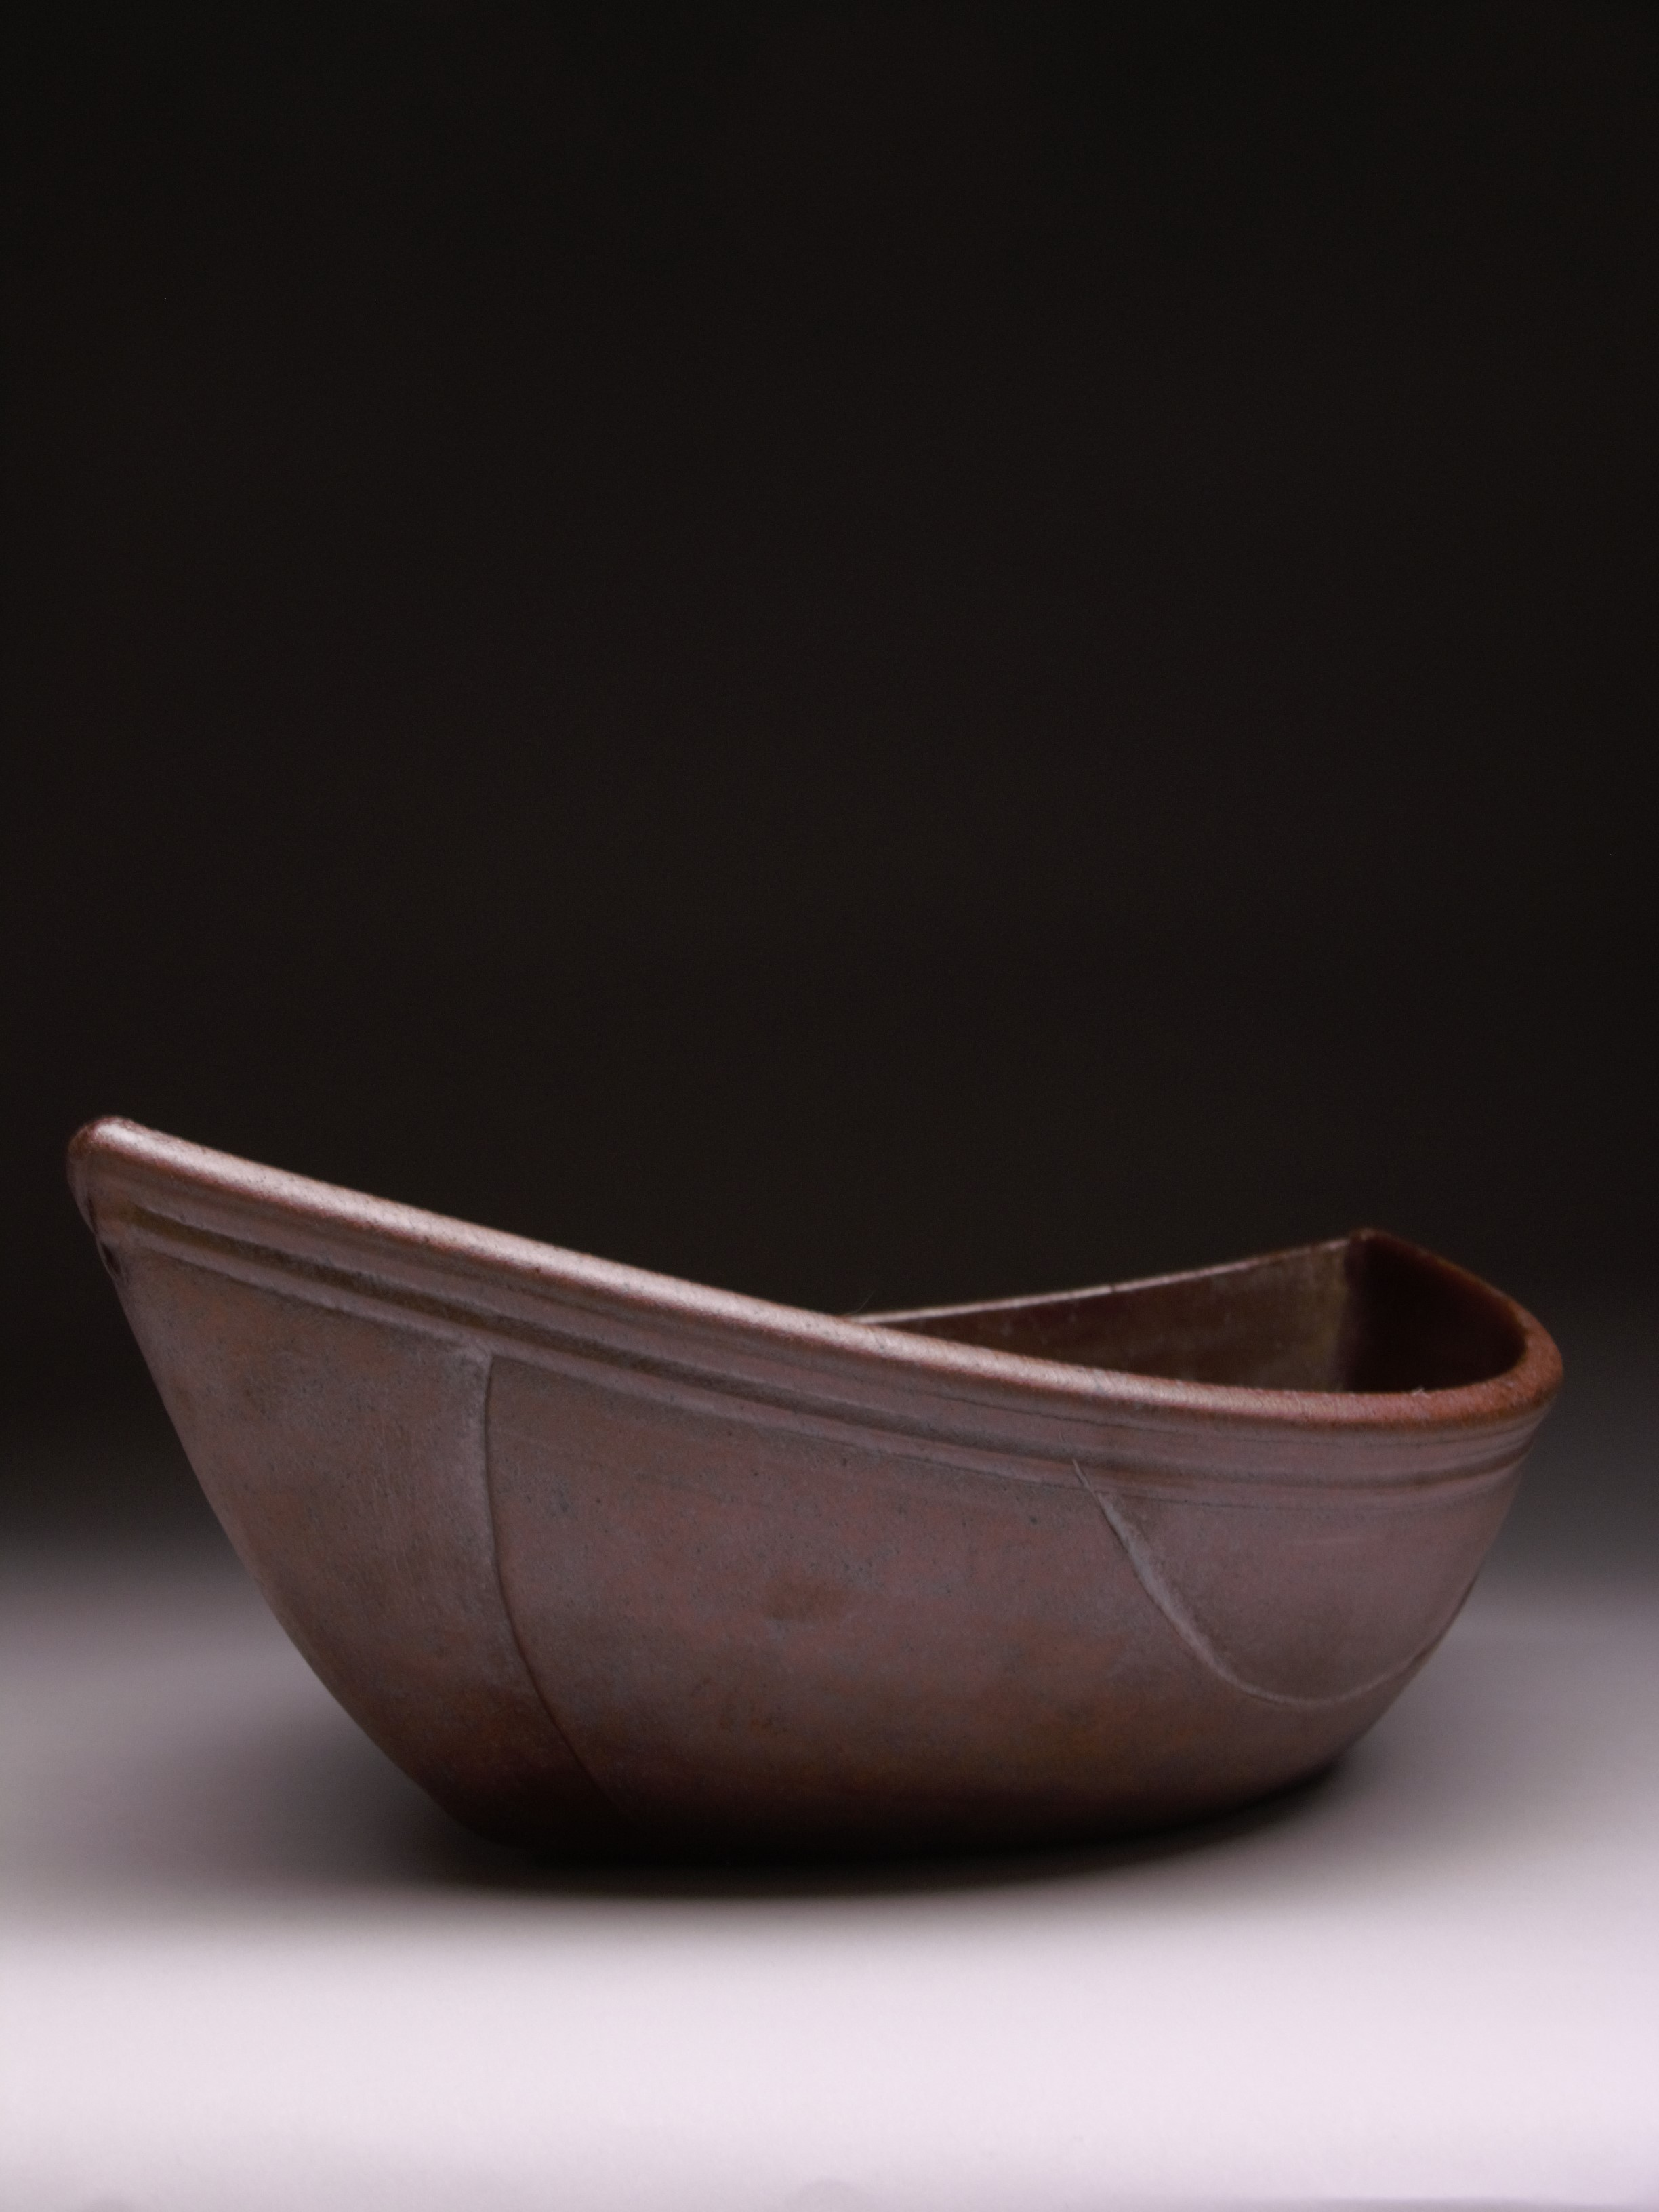 WOODFIRED CERAMIC BOAT 2004